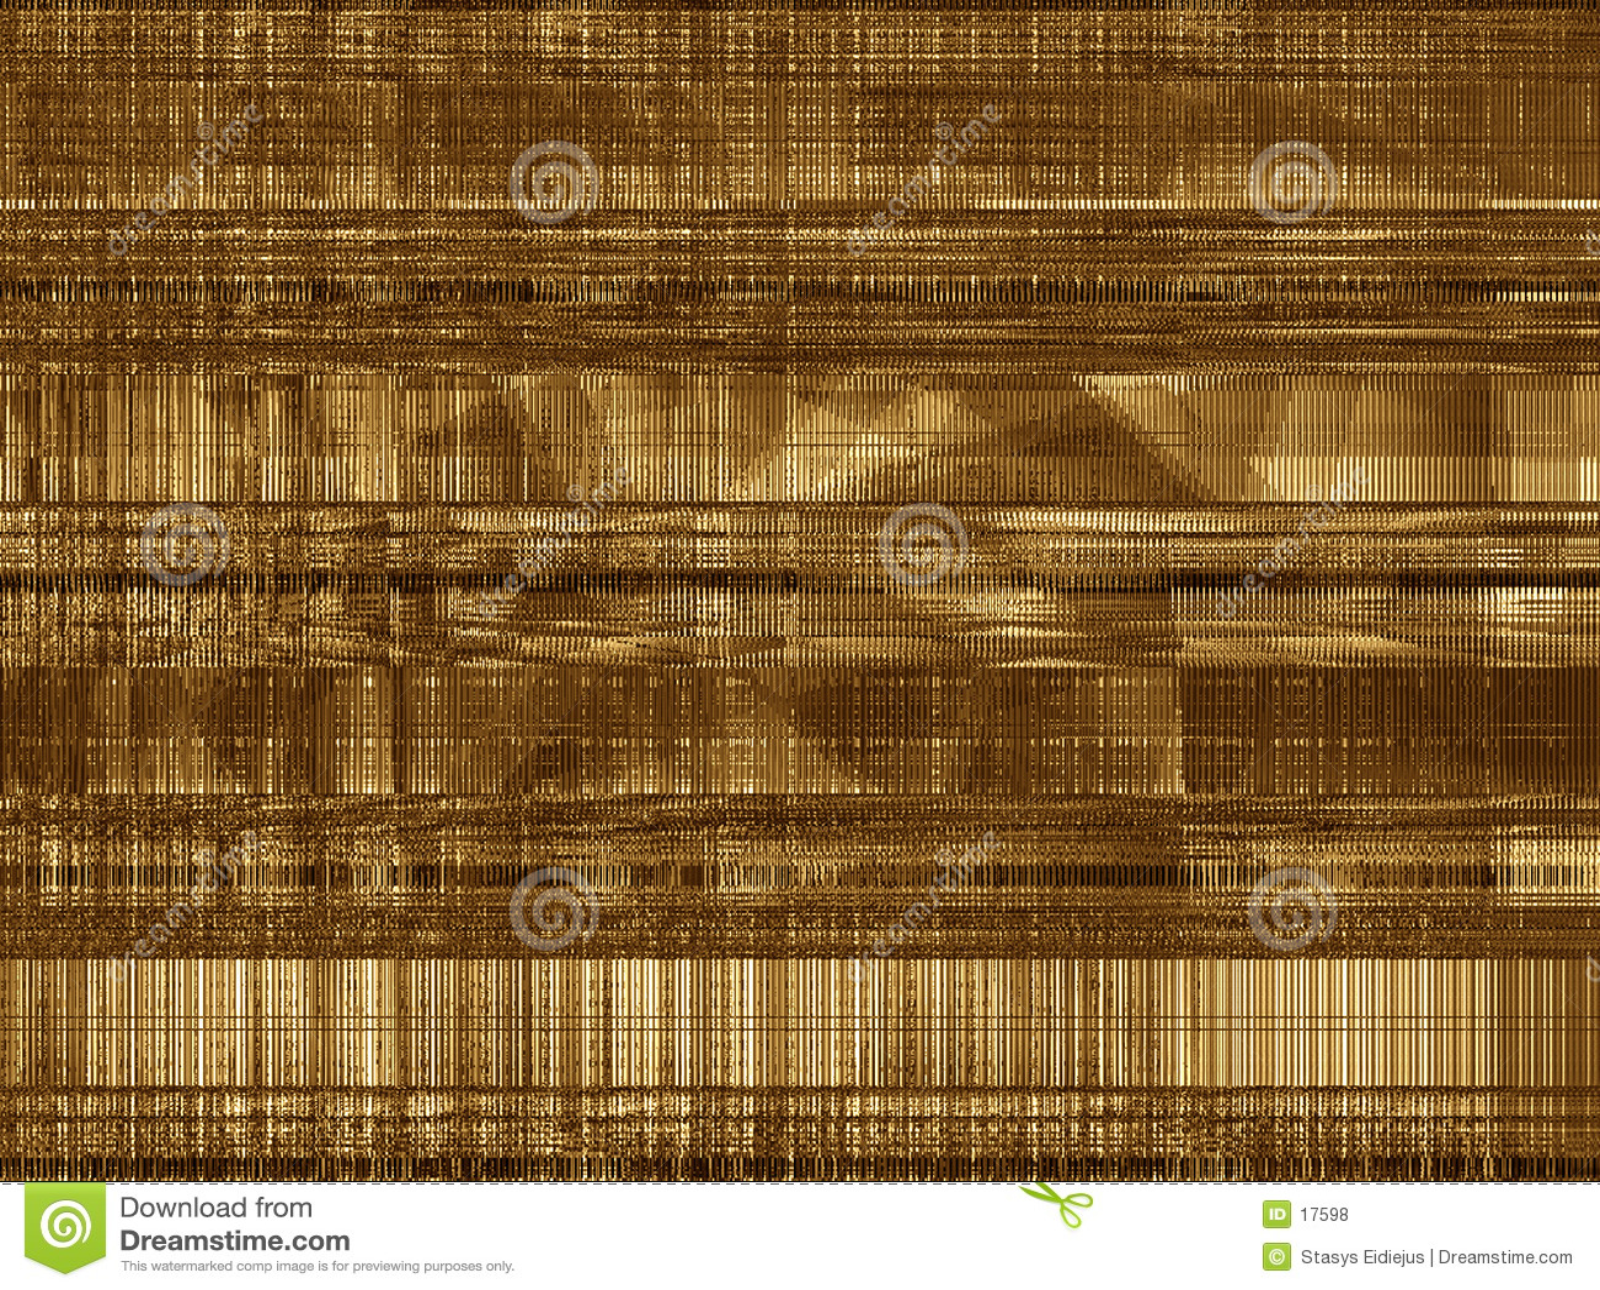 Abstracte kleine en gedetailleerde textuur als achtergrond